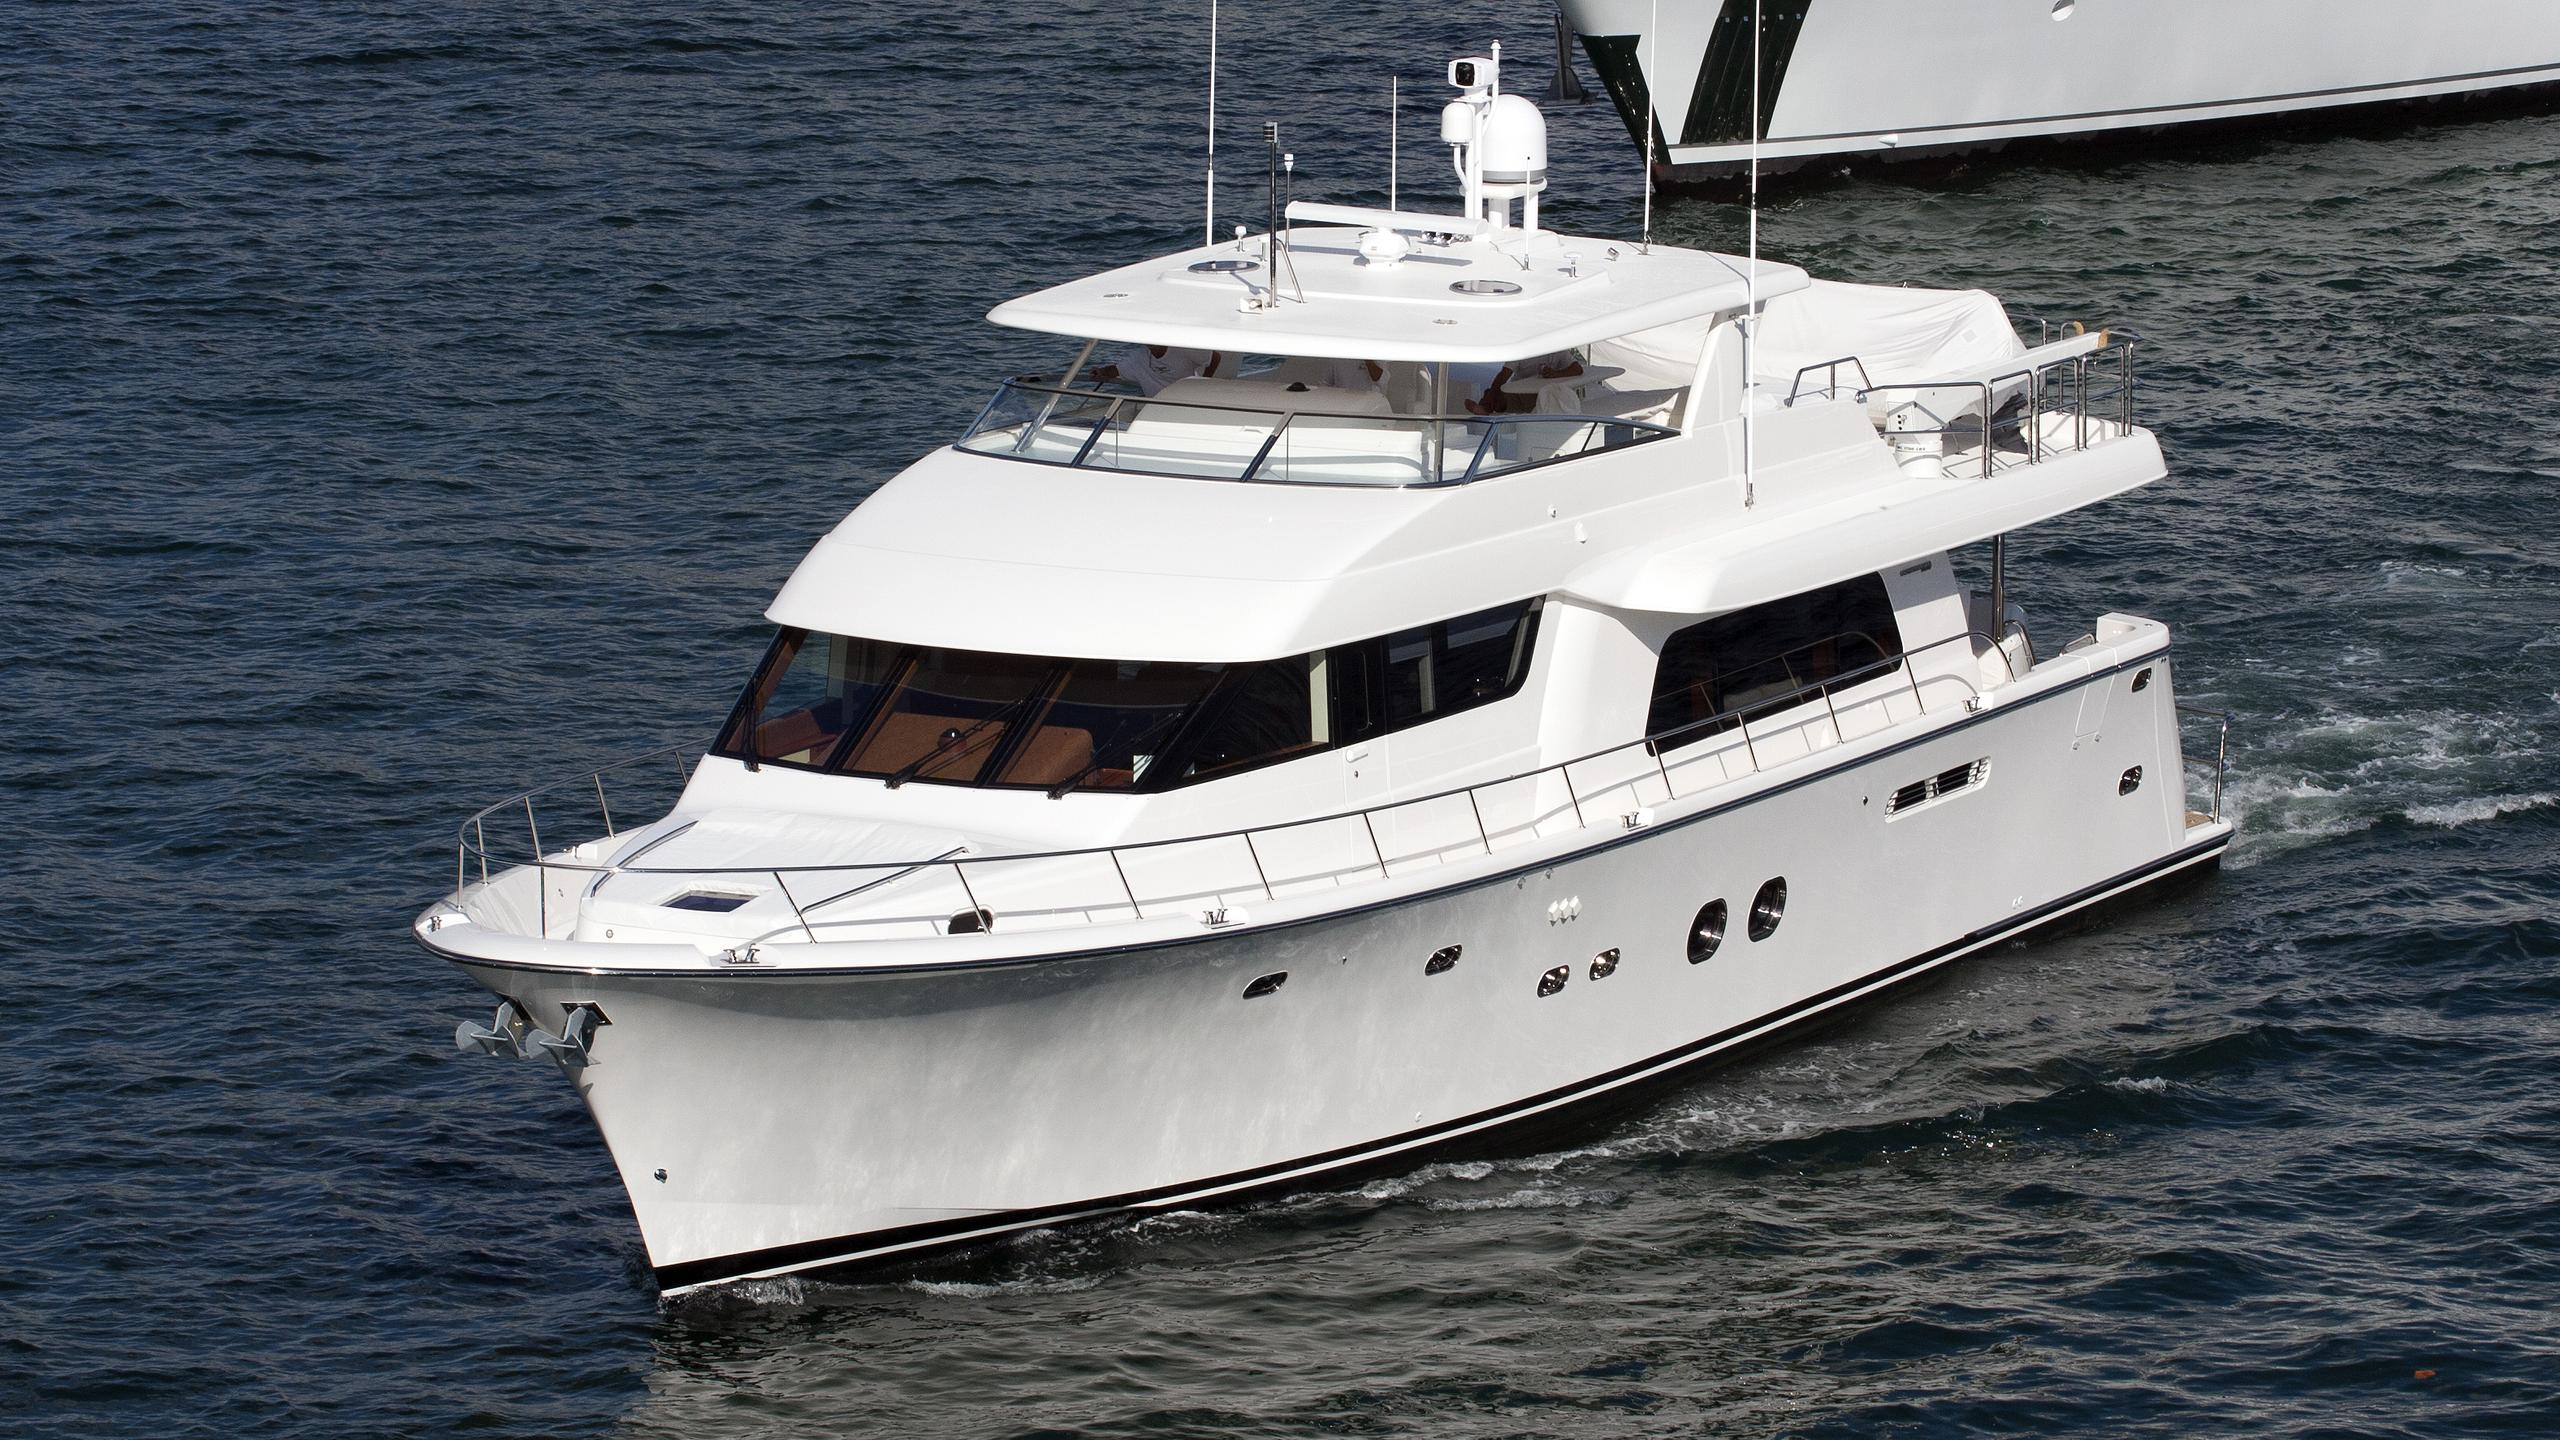 nota-bene-motor-yacht-pacific-mariner-85-2010-26m-half-profile